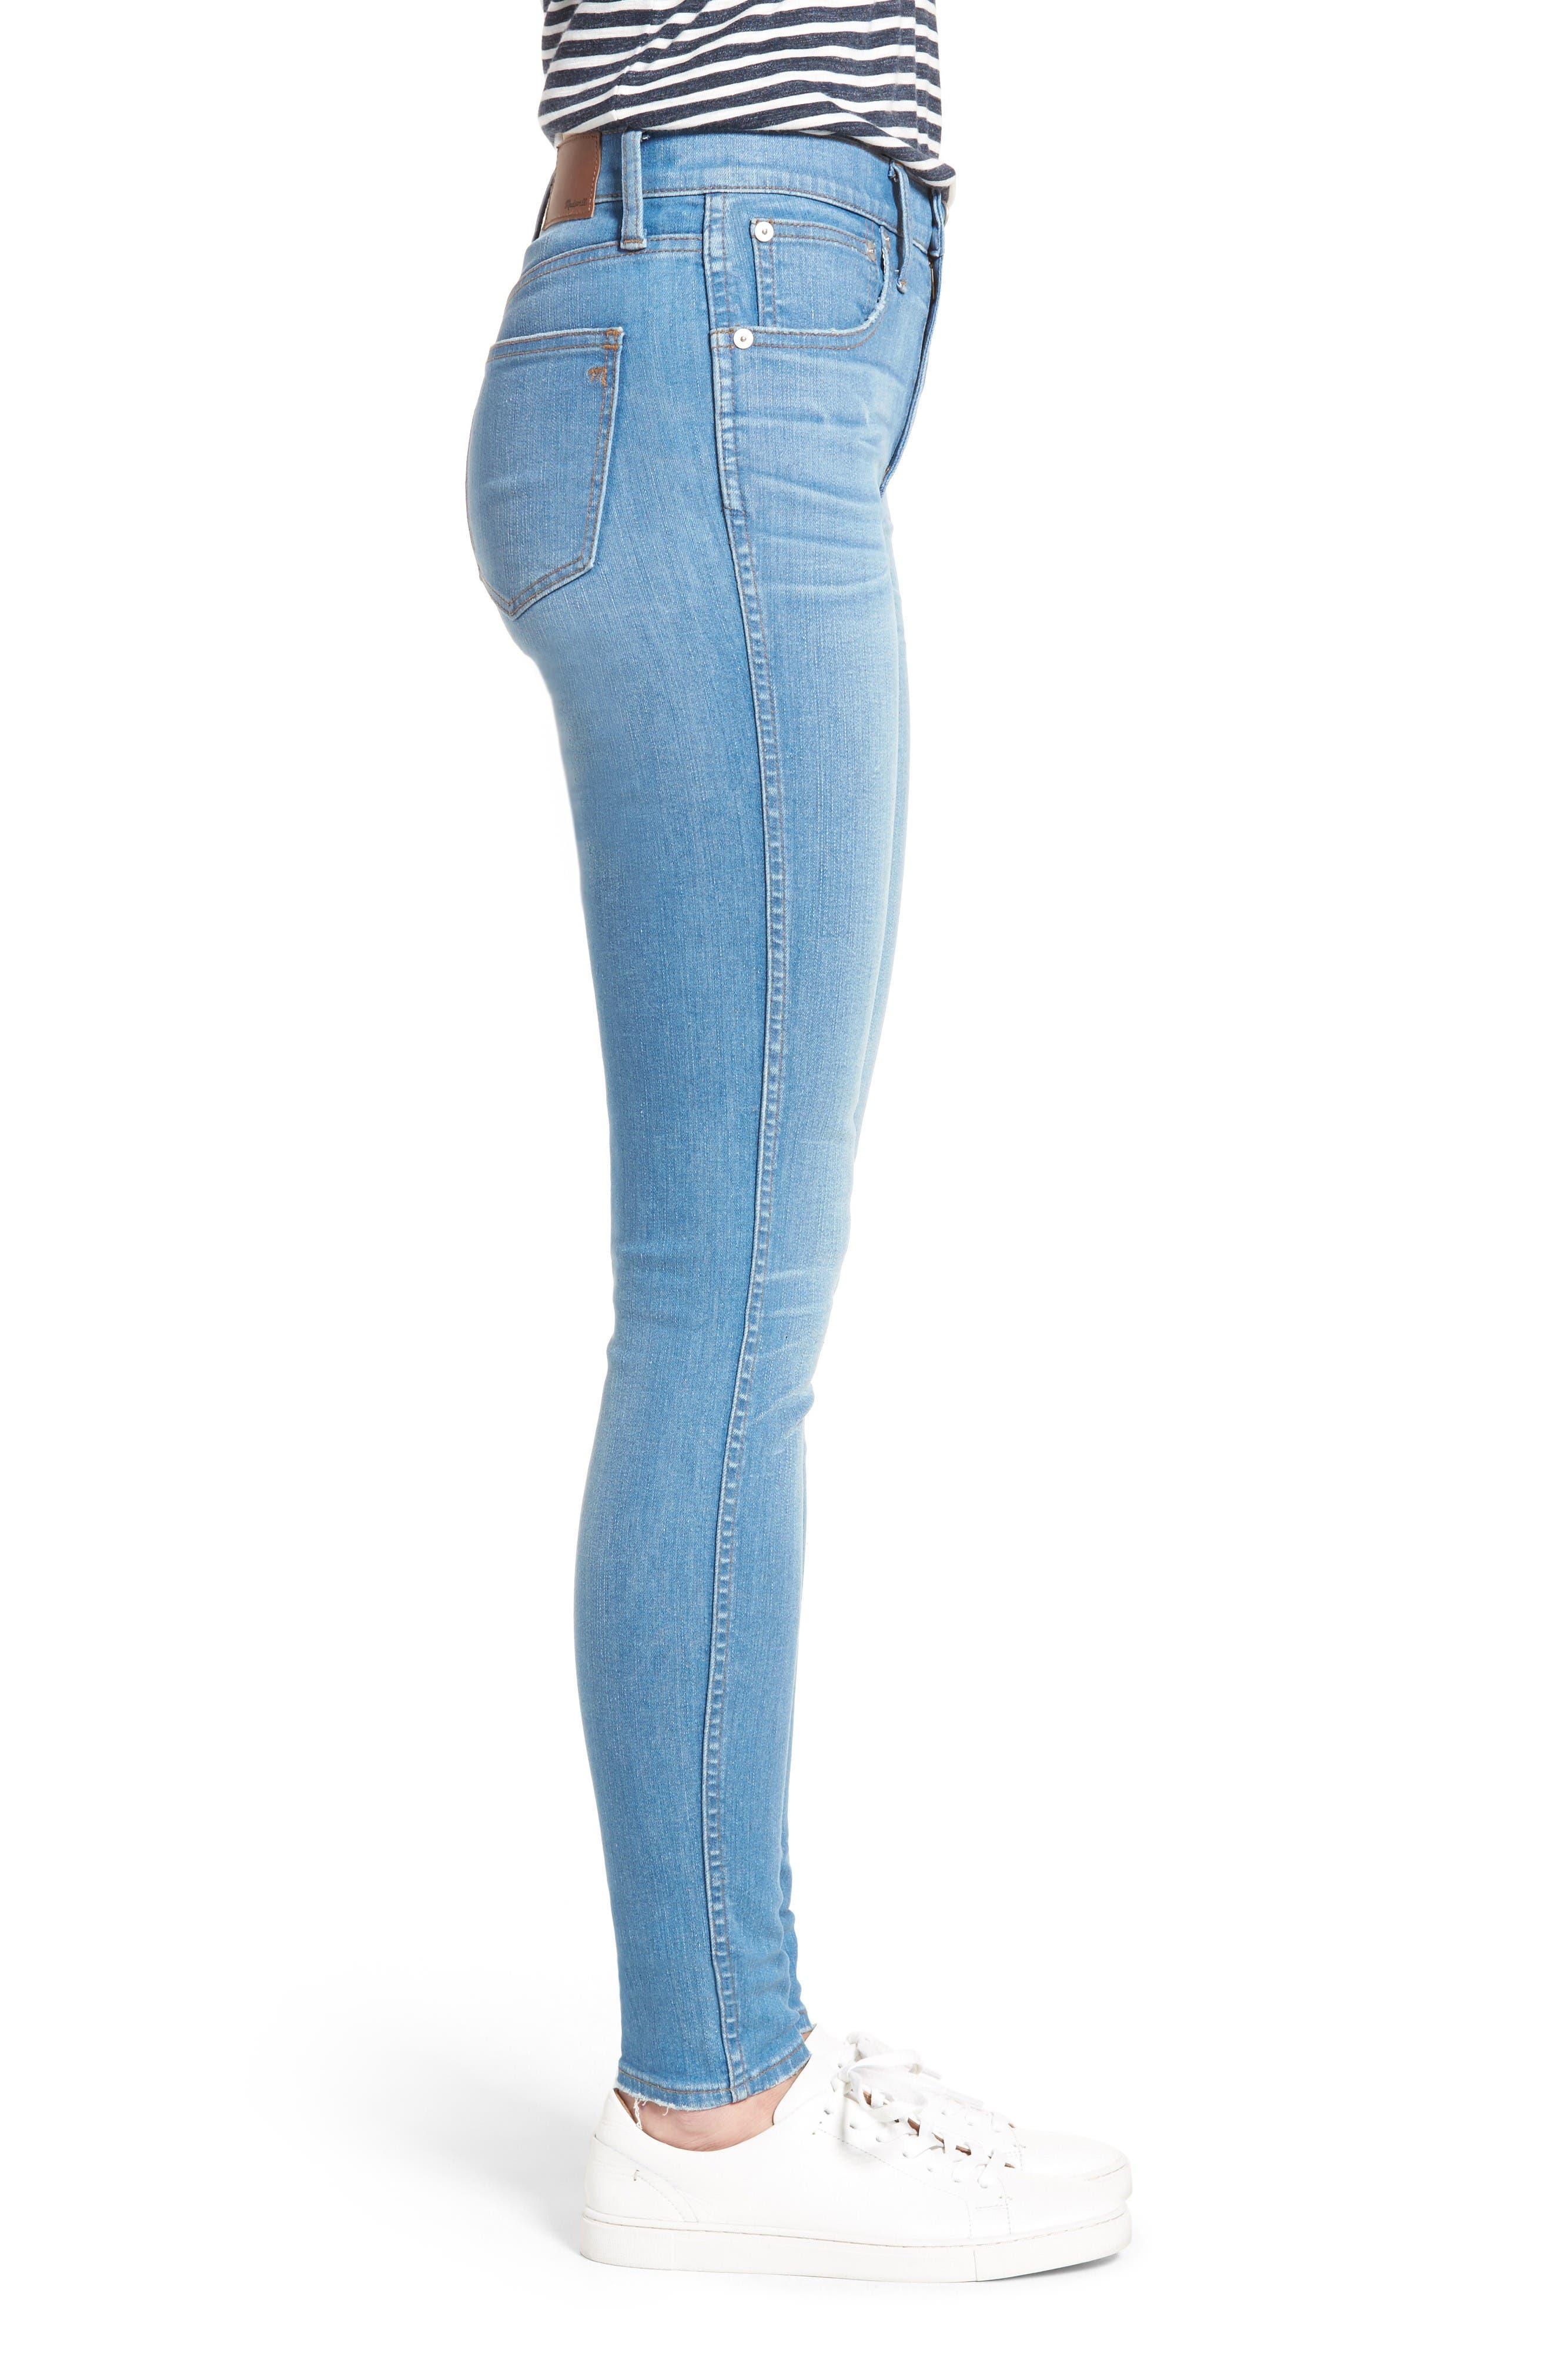 Alternate Image 3  - Madewell High Rise Skinny Jeans (Hank Wash)